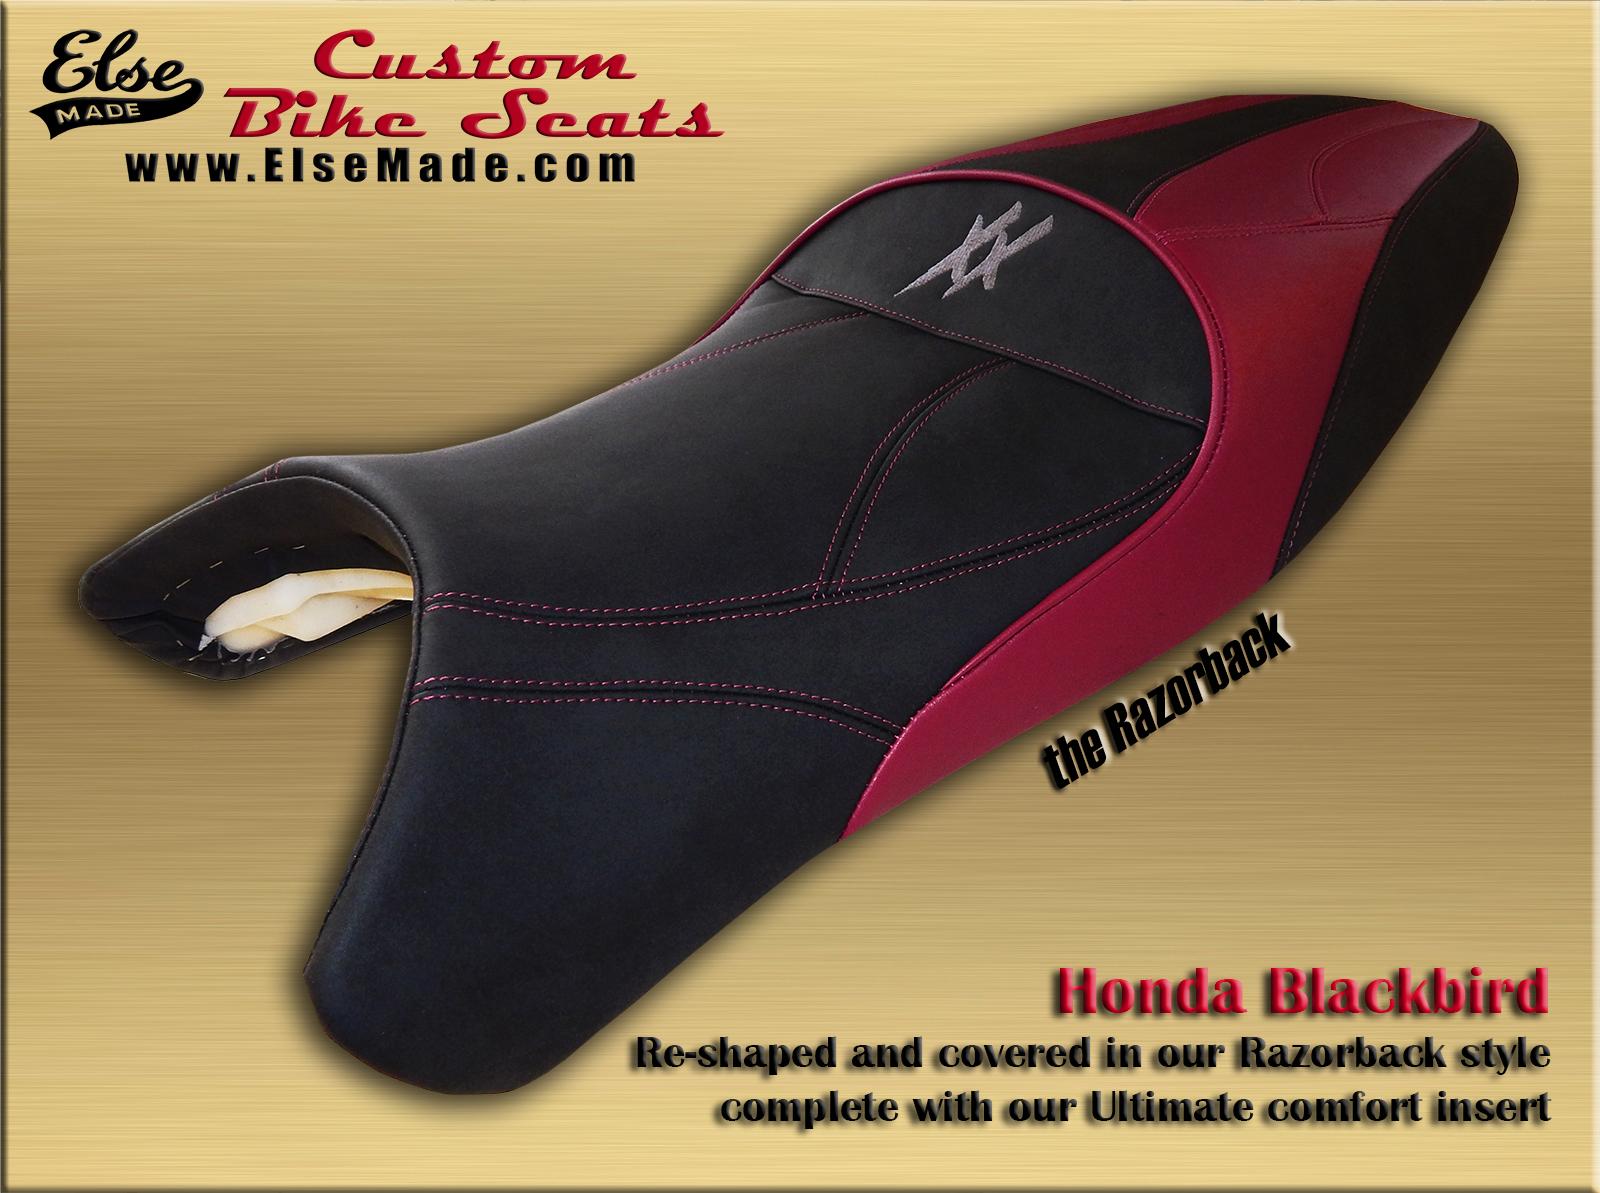 blackbird razorback 4 full size.jpg